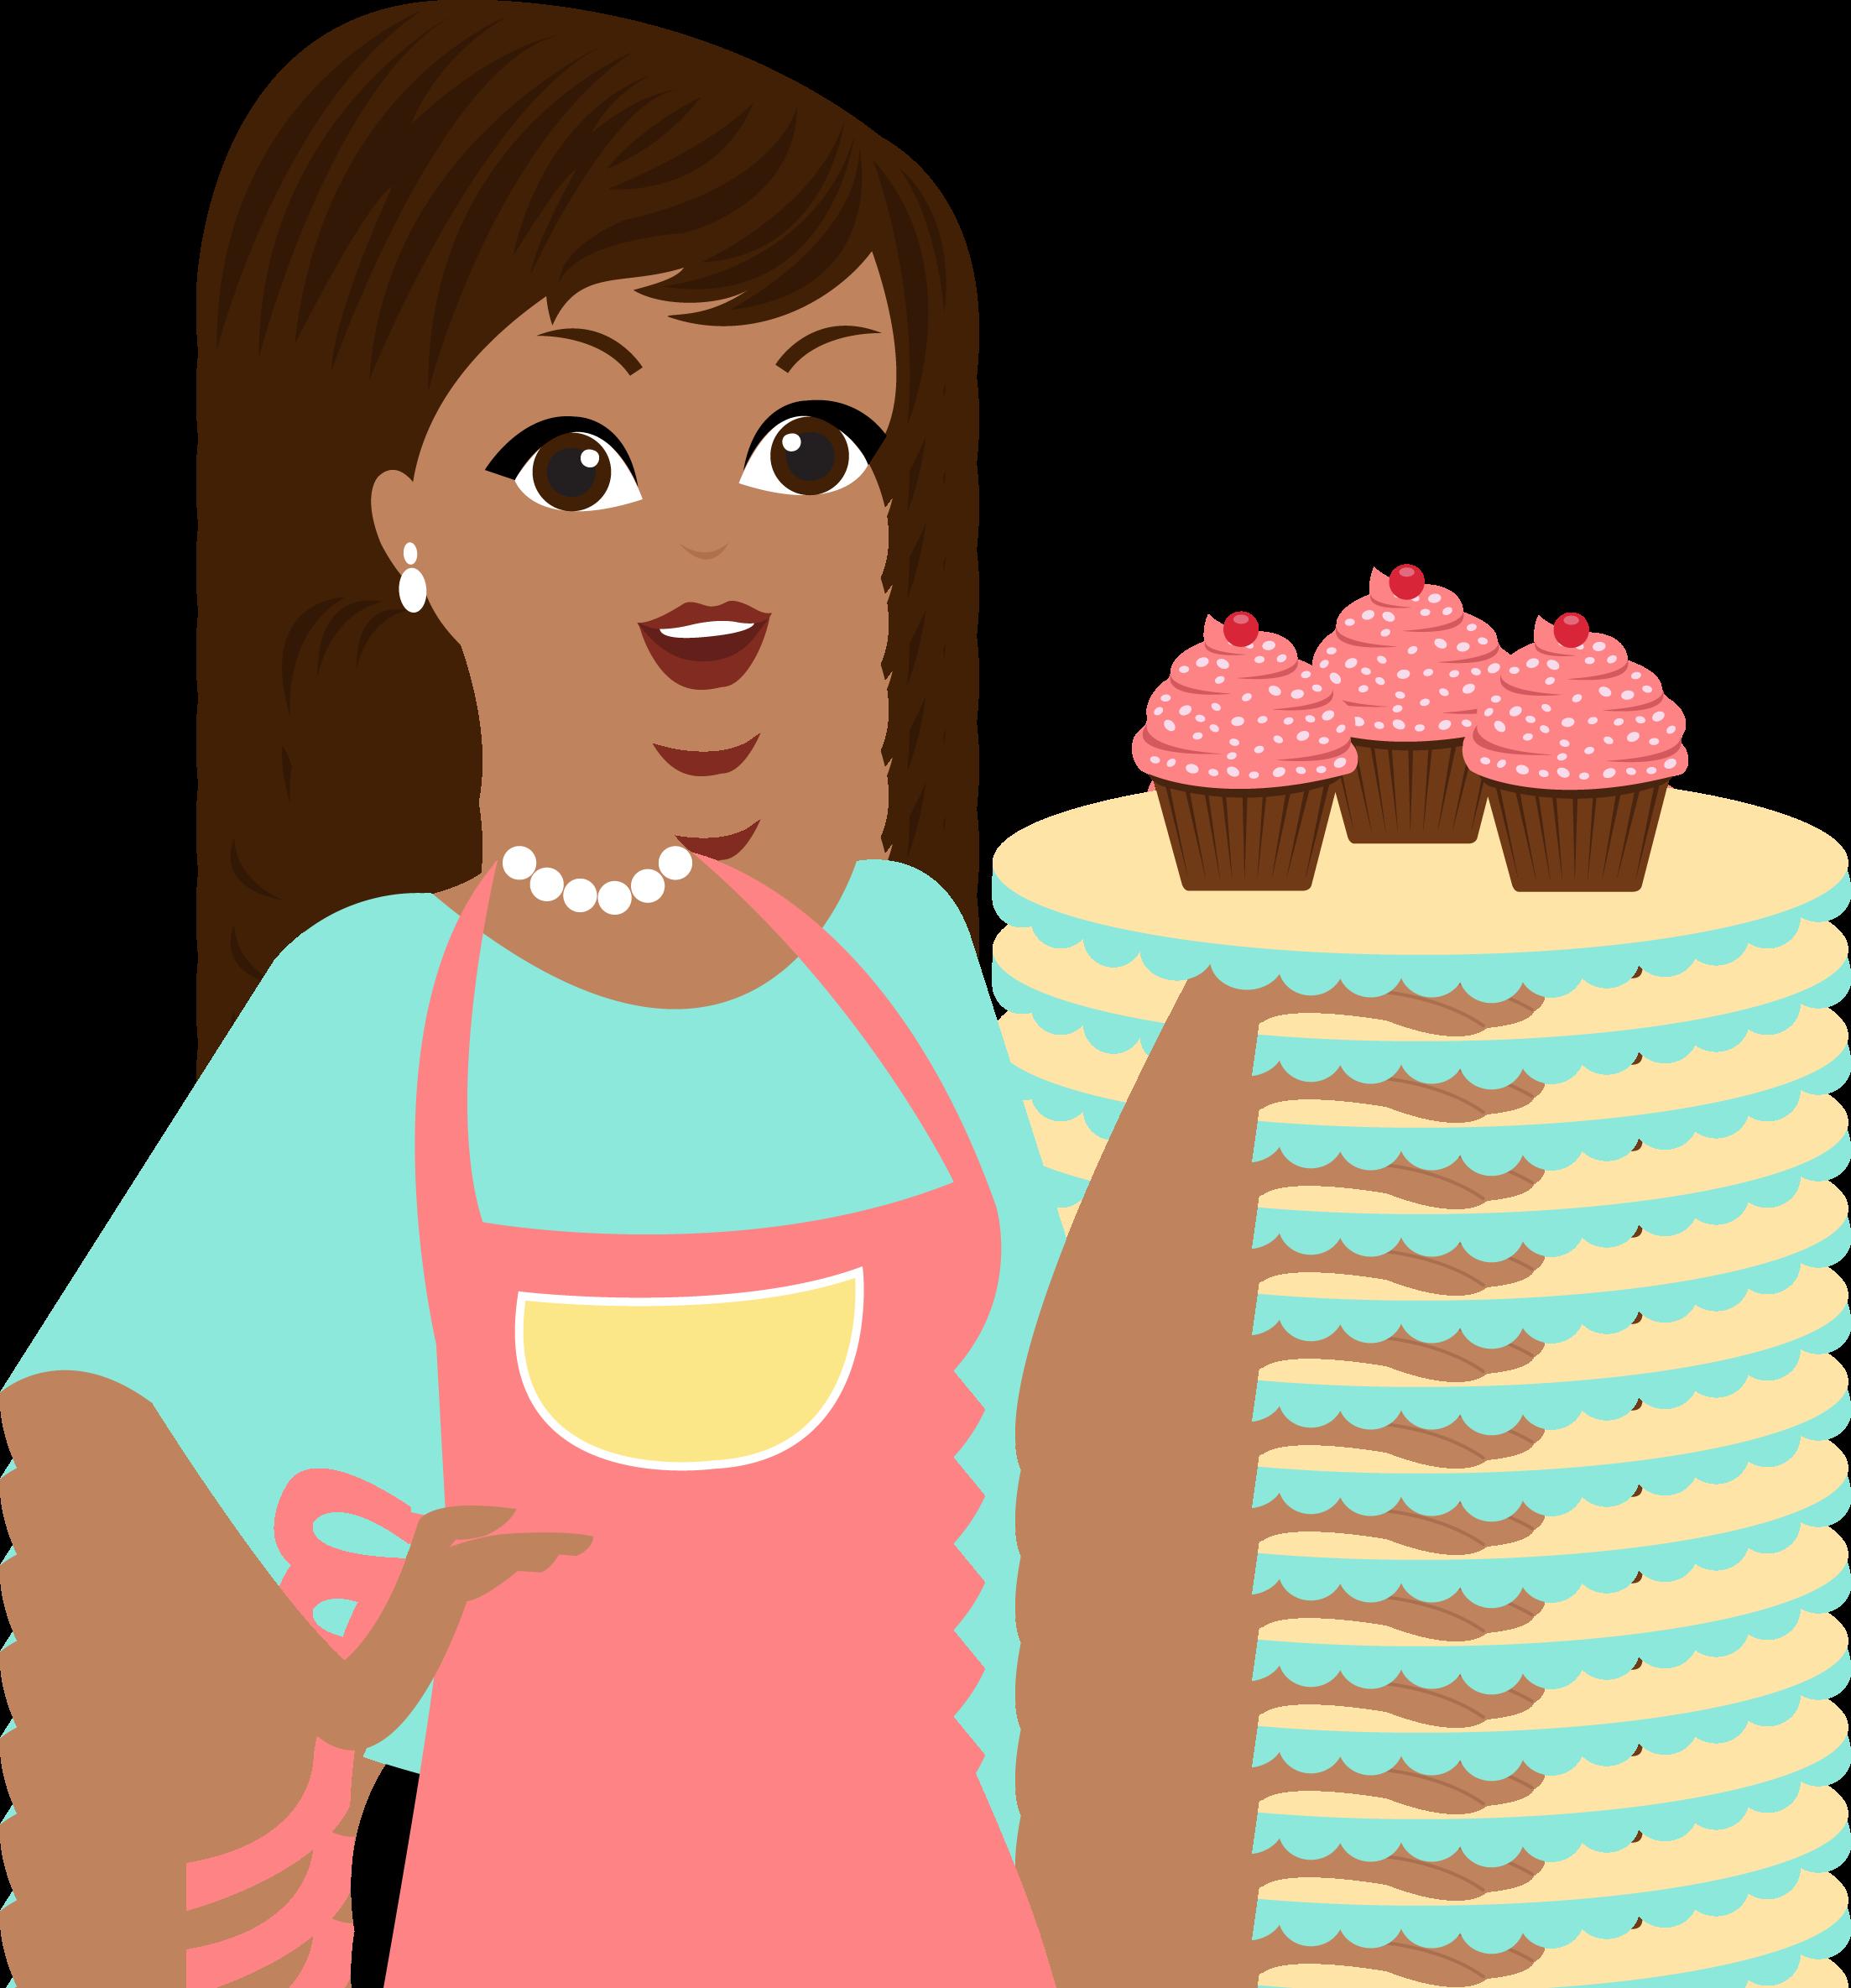 Pin de mar a vecchione en ponque 2 baking party decoupage y cupcakes - Kawaii kochen ...